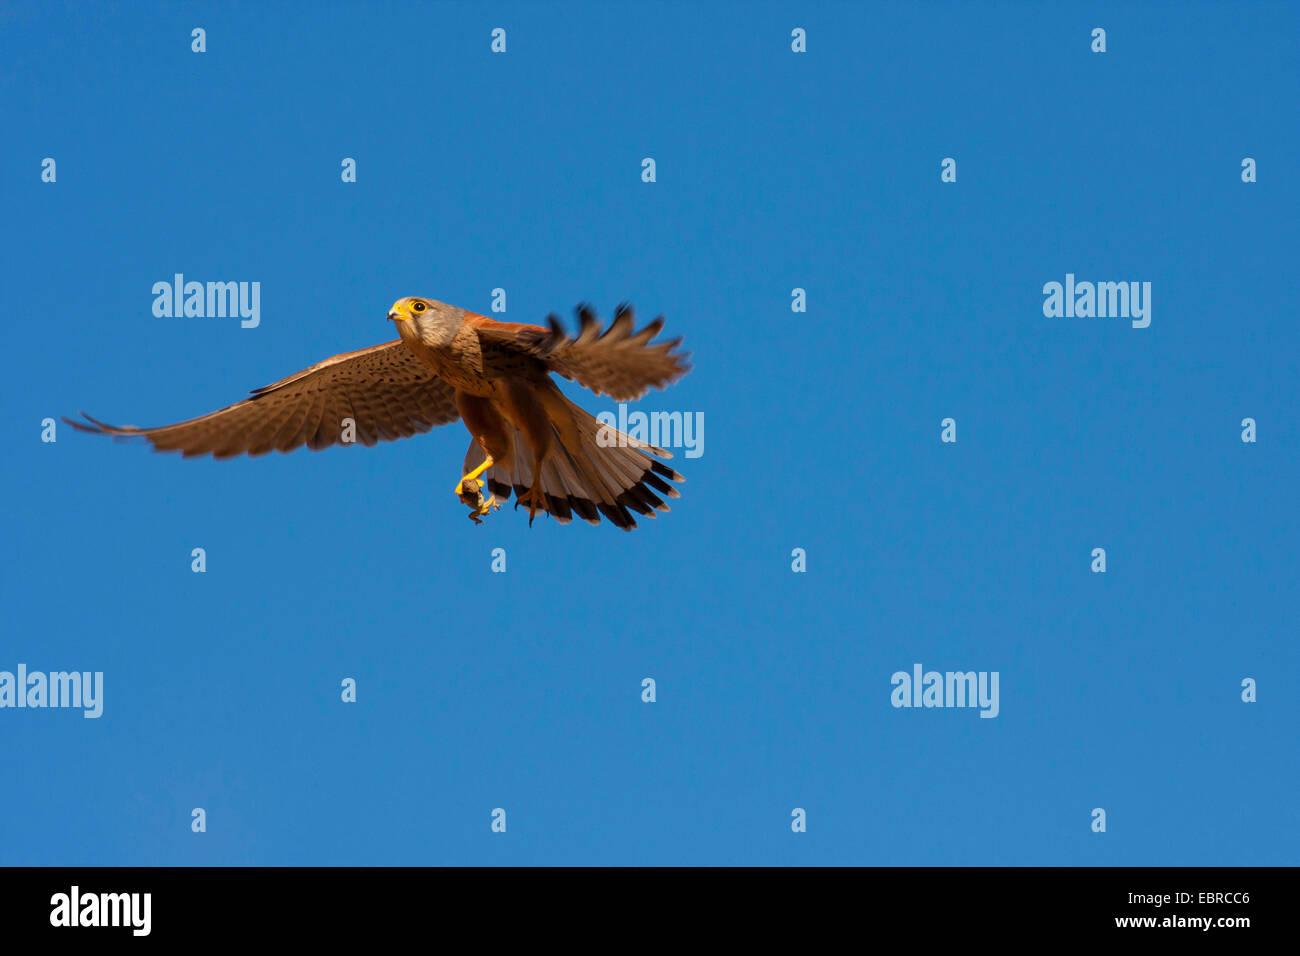 European Kestrel, Eurasian Kestrel, Old World Kestrel, Common Kestrel (Falco tinnunculus), in flight with prey, - Stock Image